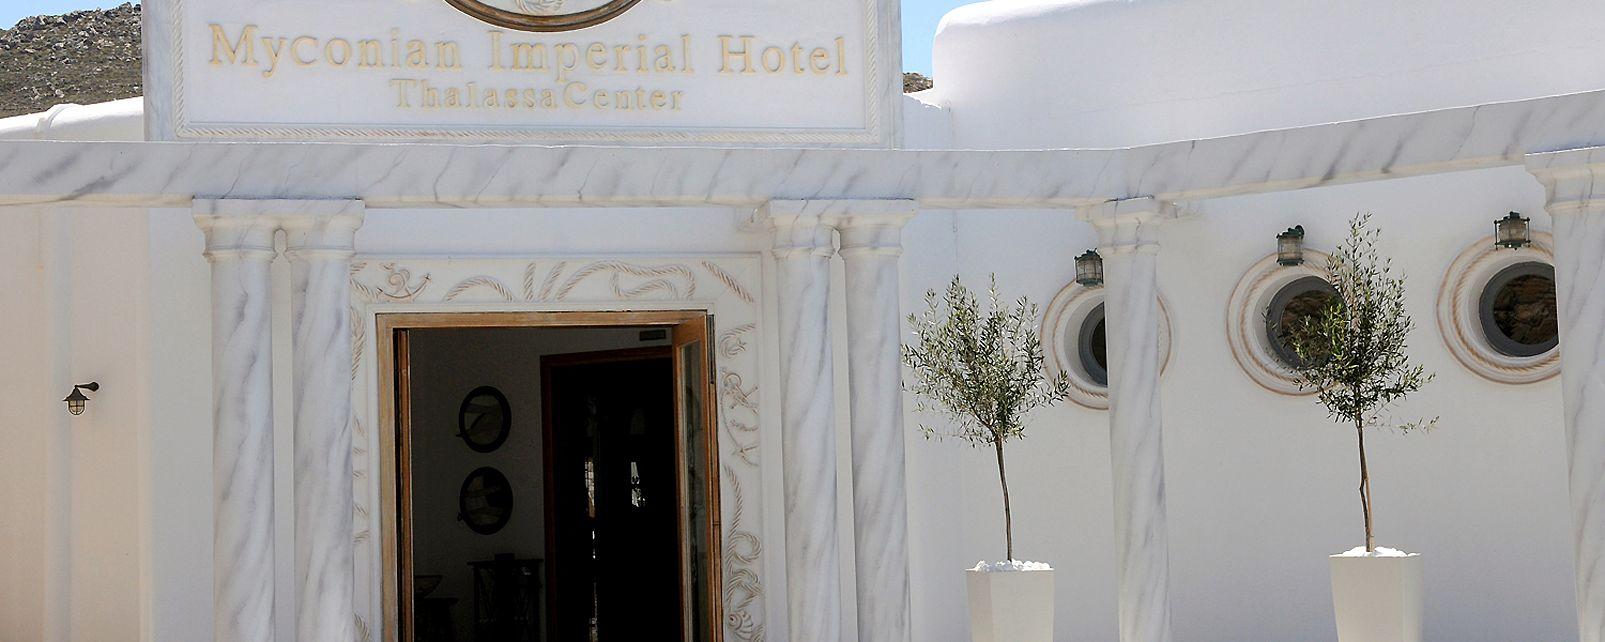 Hotel Myconian Imperial